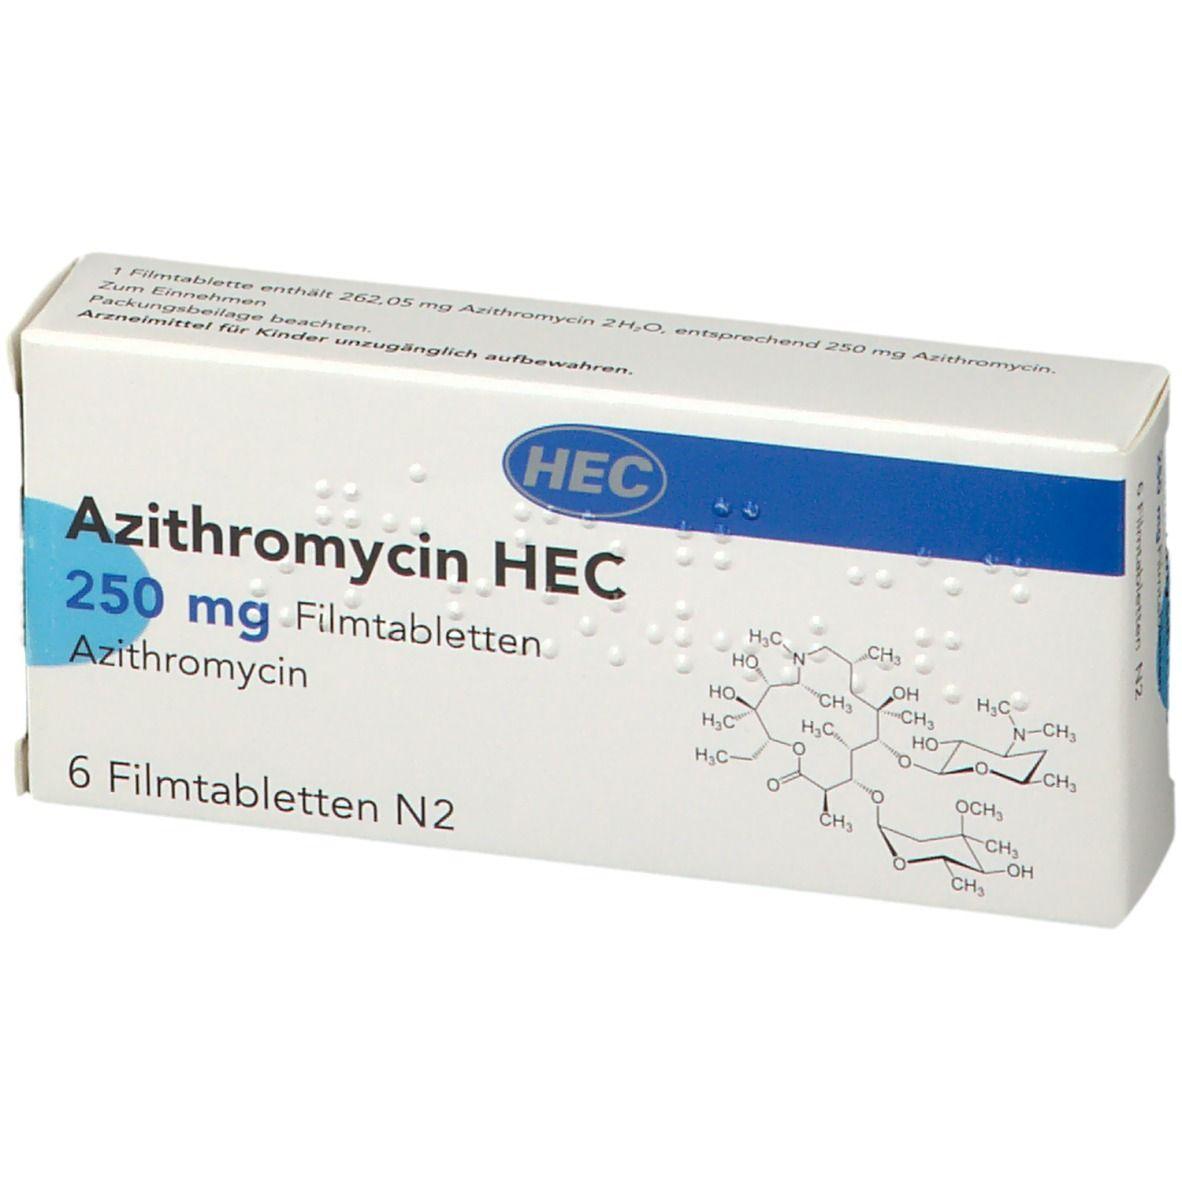 preis azithromycin 250mg medikation